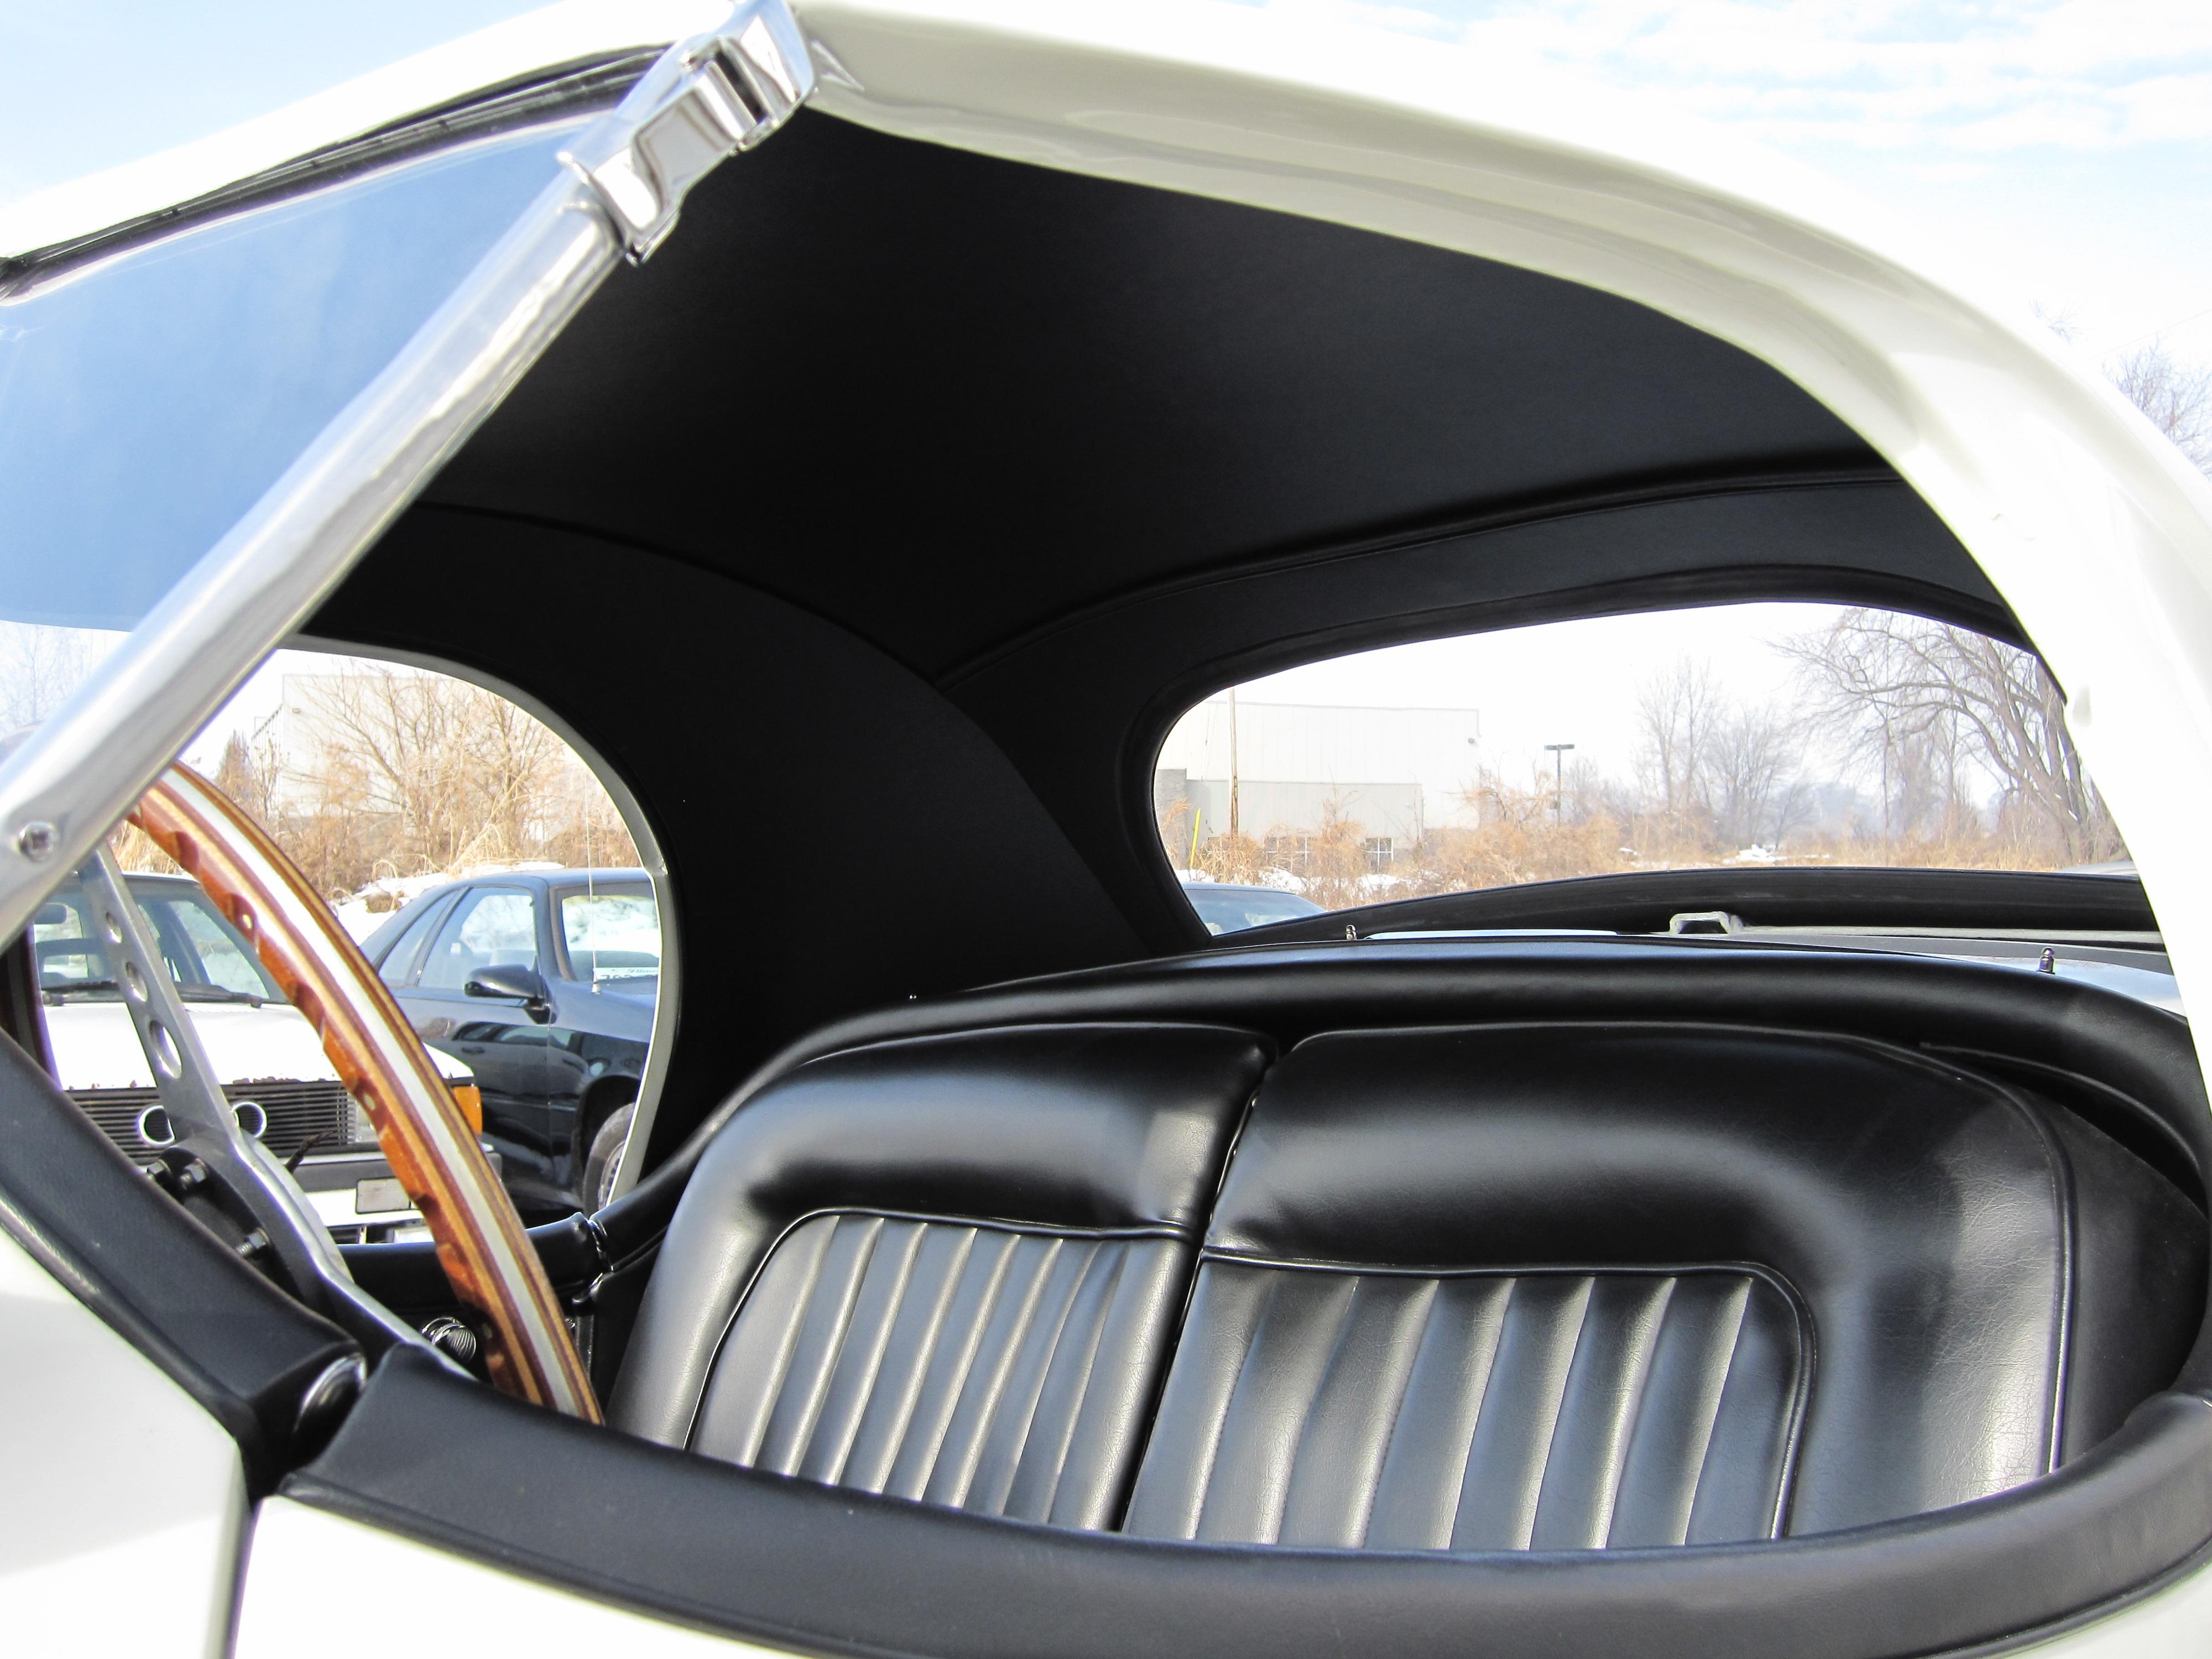 1957 Jaguar XK140 Hardtop